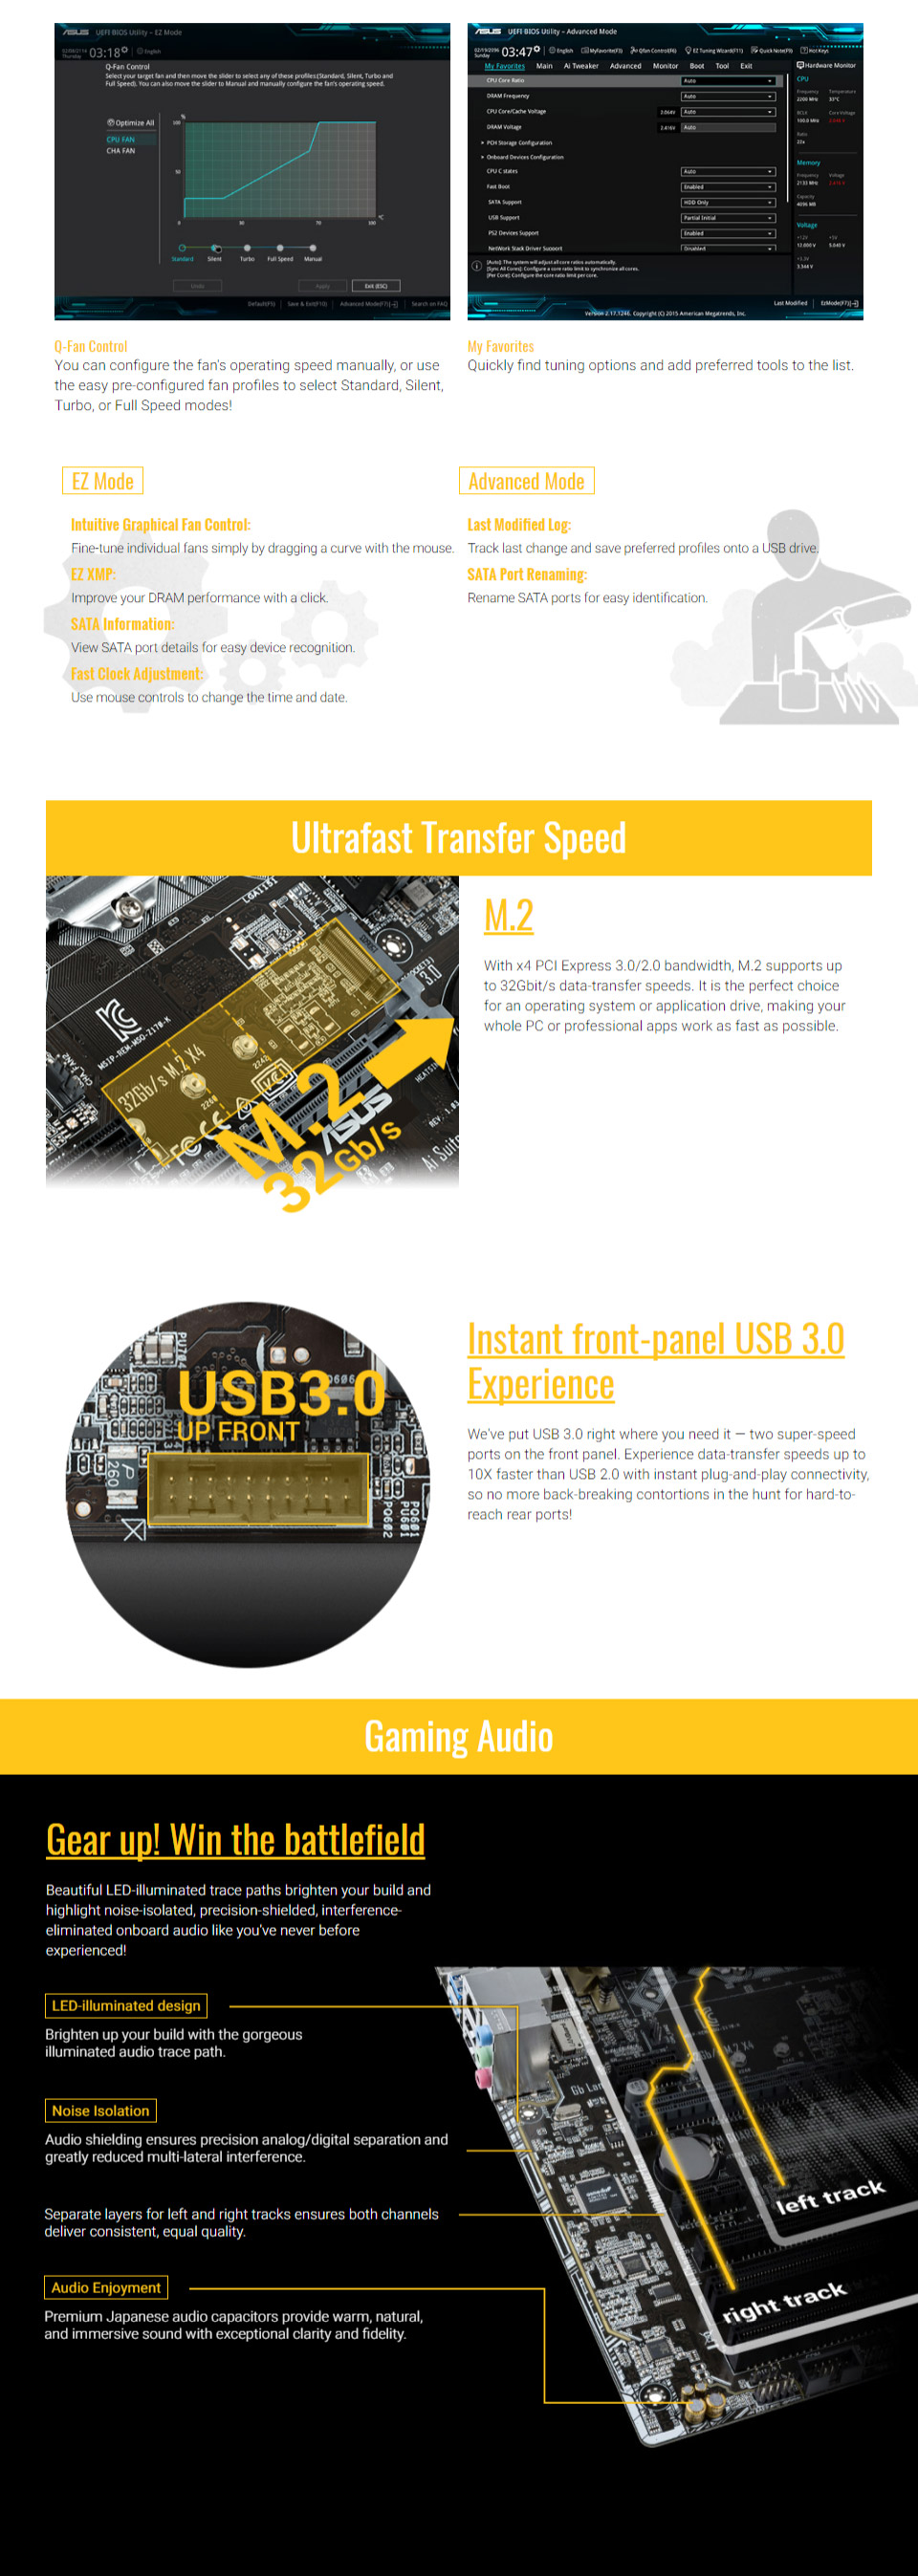 ASUS E3M-ET V5V5 REALTEK AUDIO WINDOWS 8.1 DRIVER